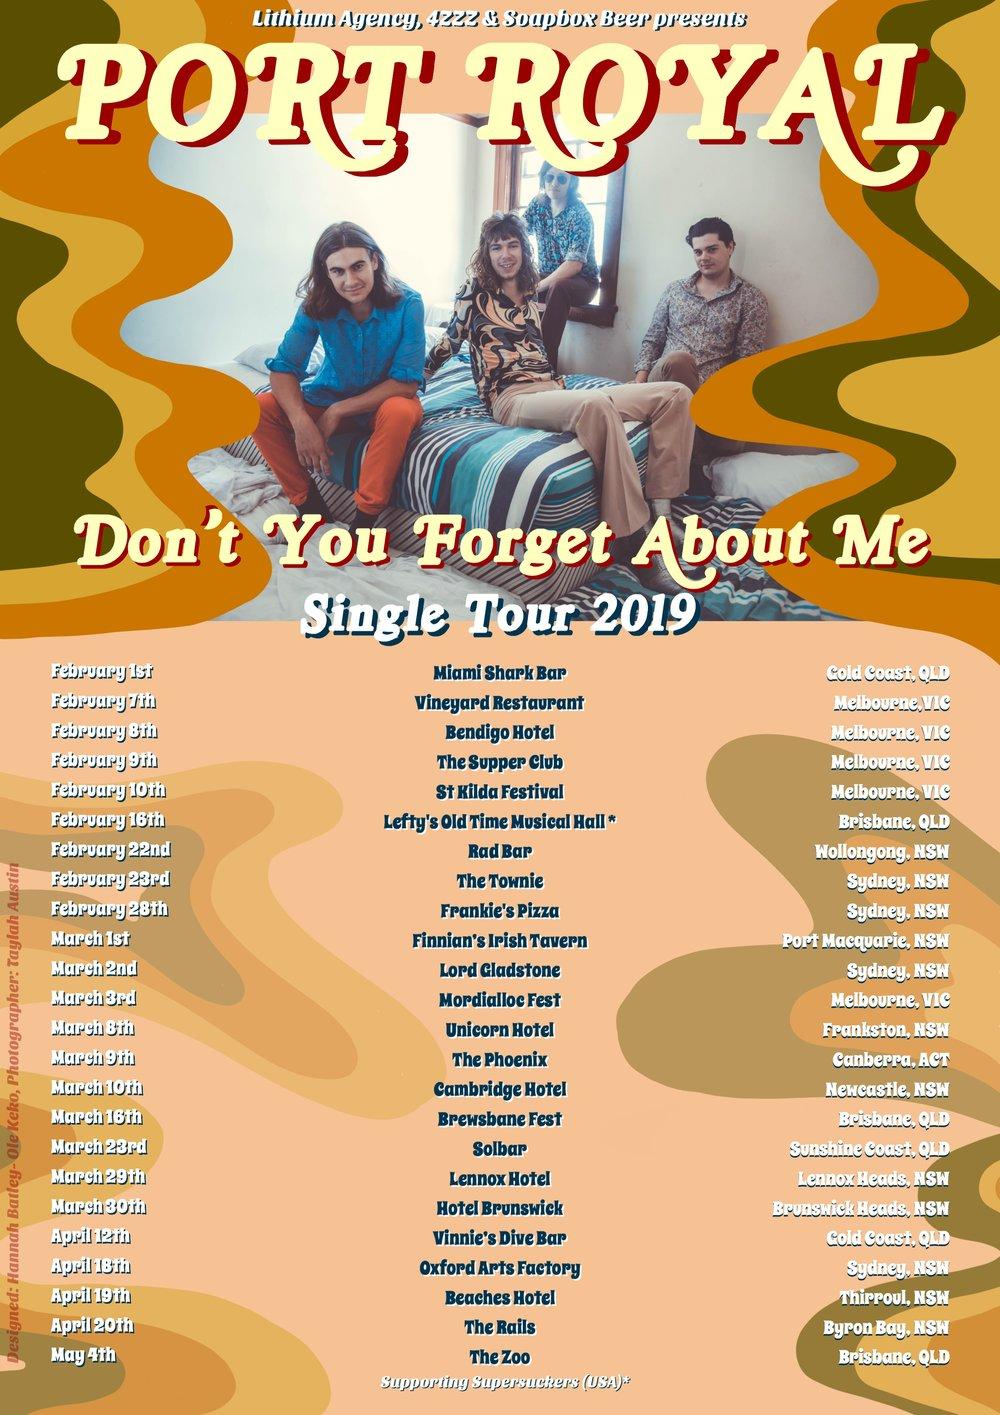 DYFAM 2019 Tour Poster.jpg